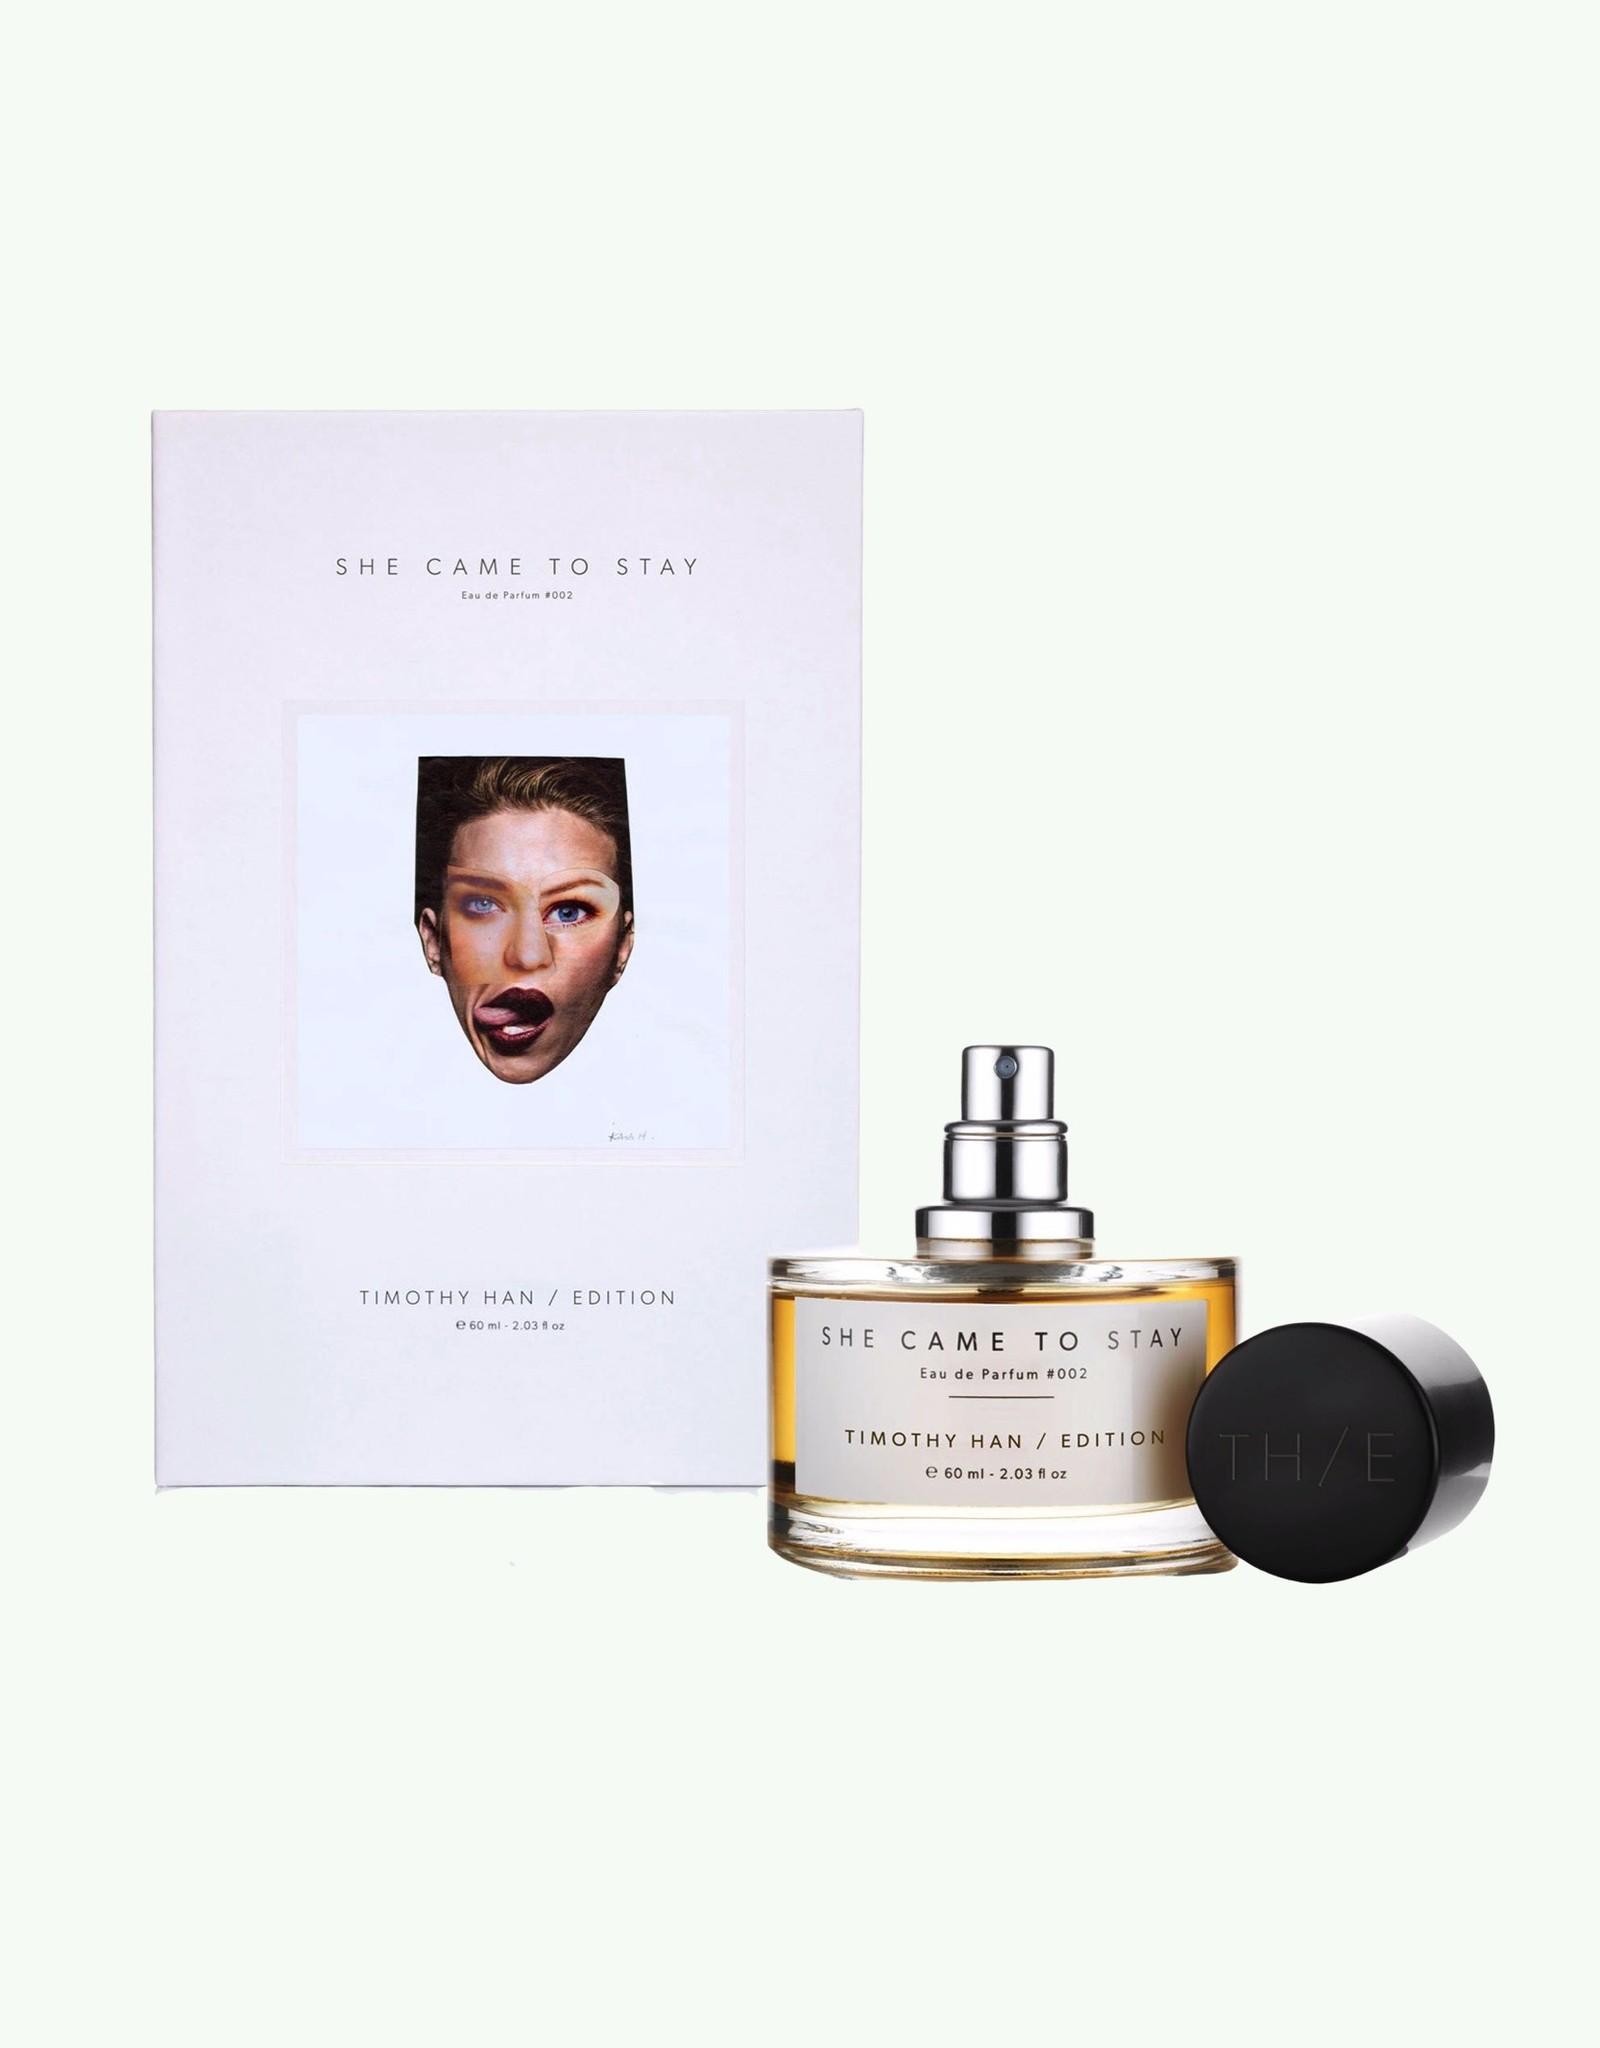 Timothy Han / Edition Timothy Han / Edition - She Came to Stay - Eau de Parfum